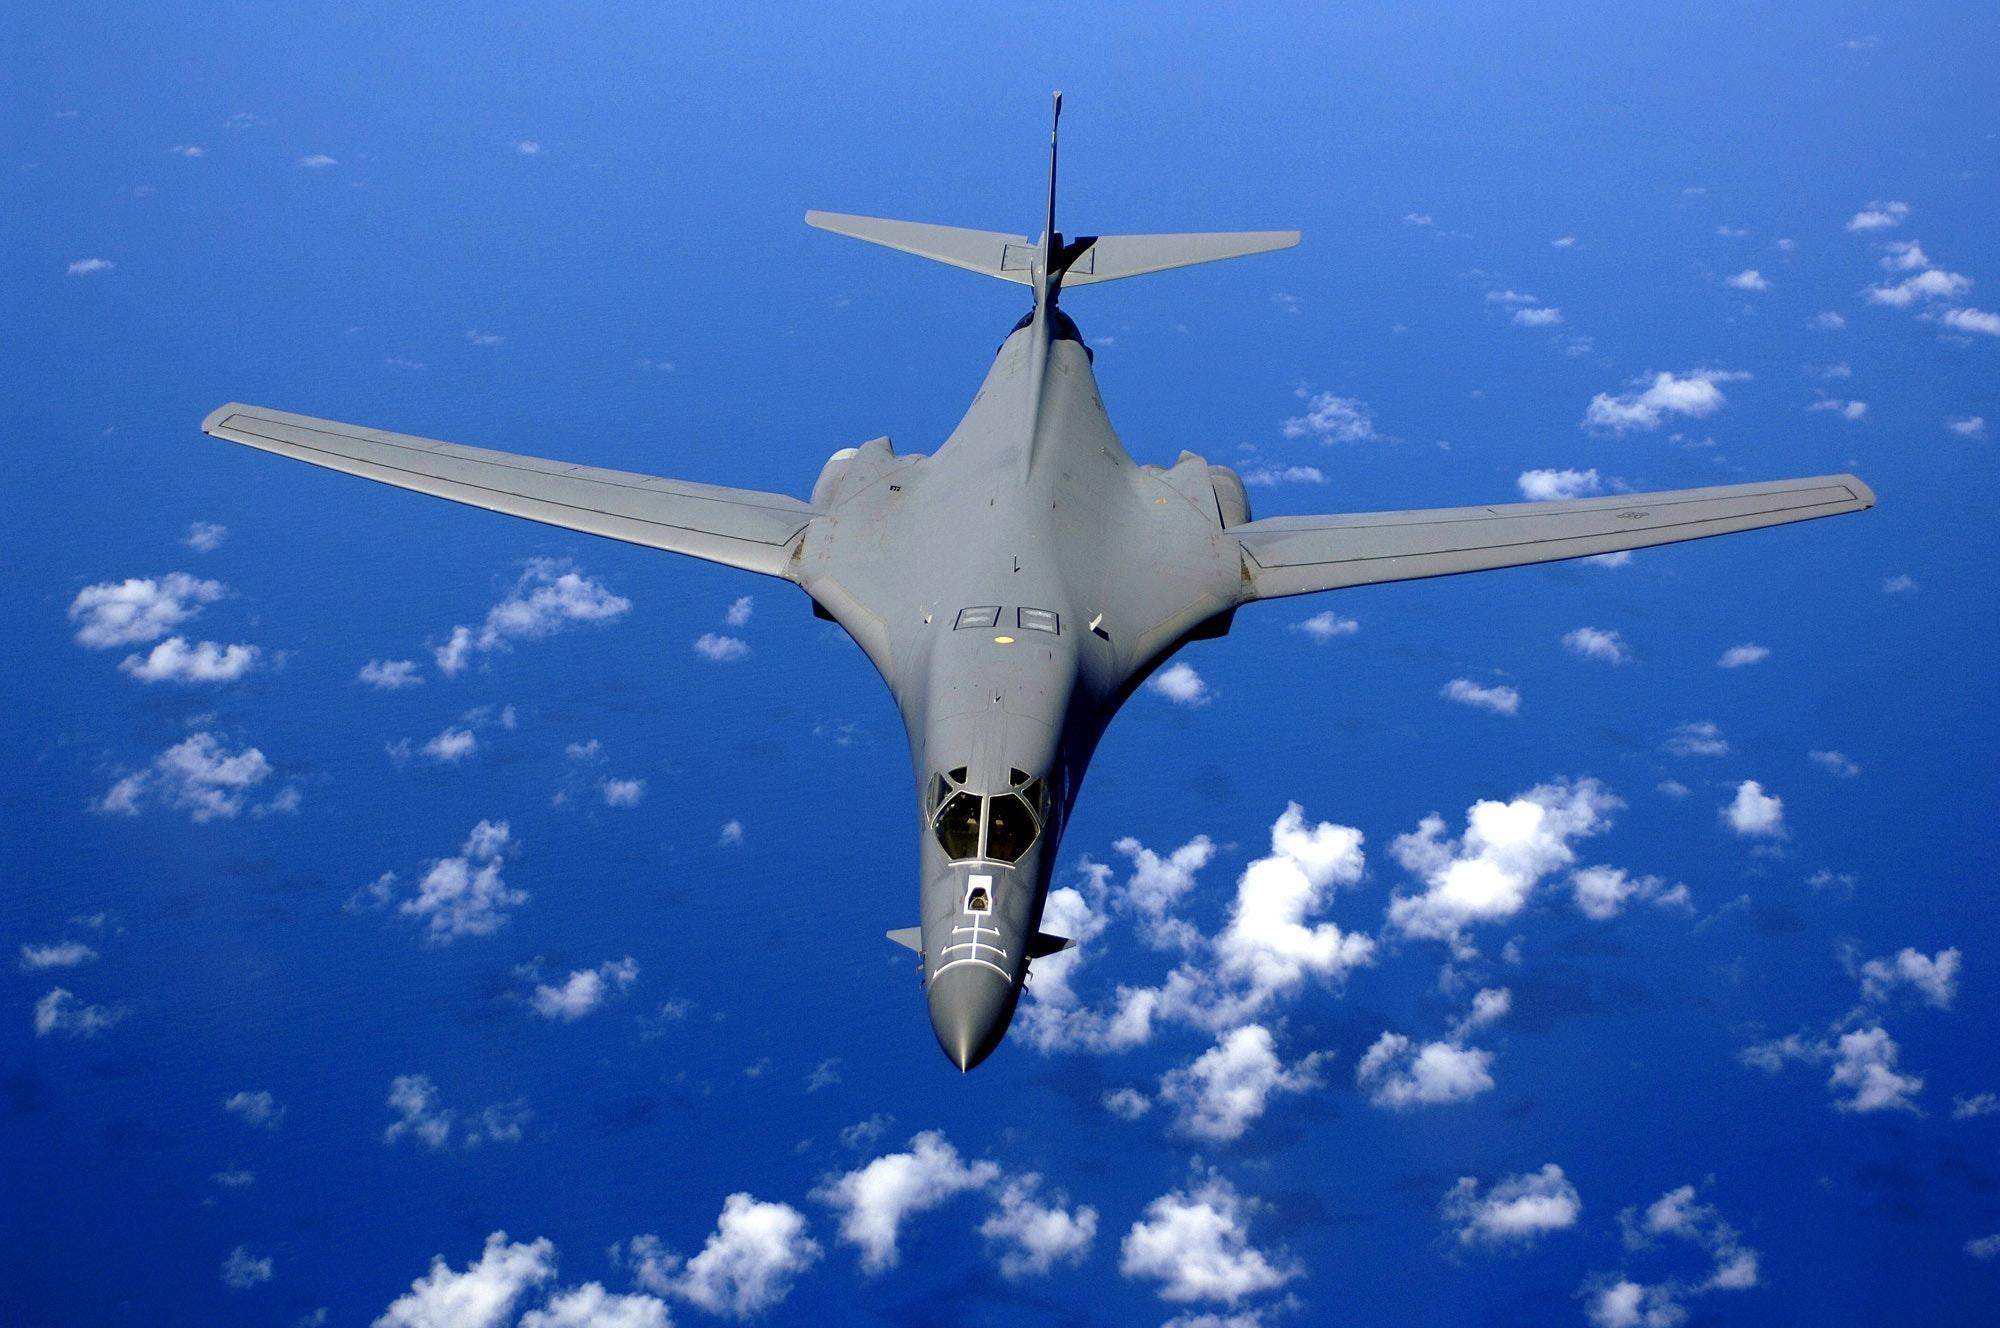 Black fighter jet near white clouds photo